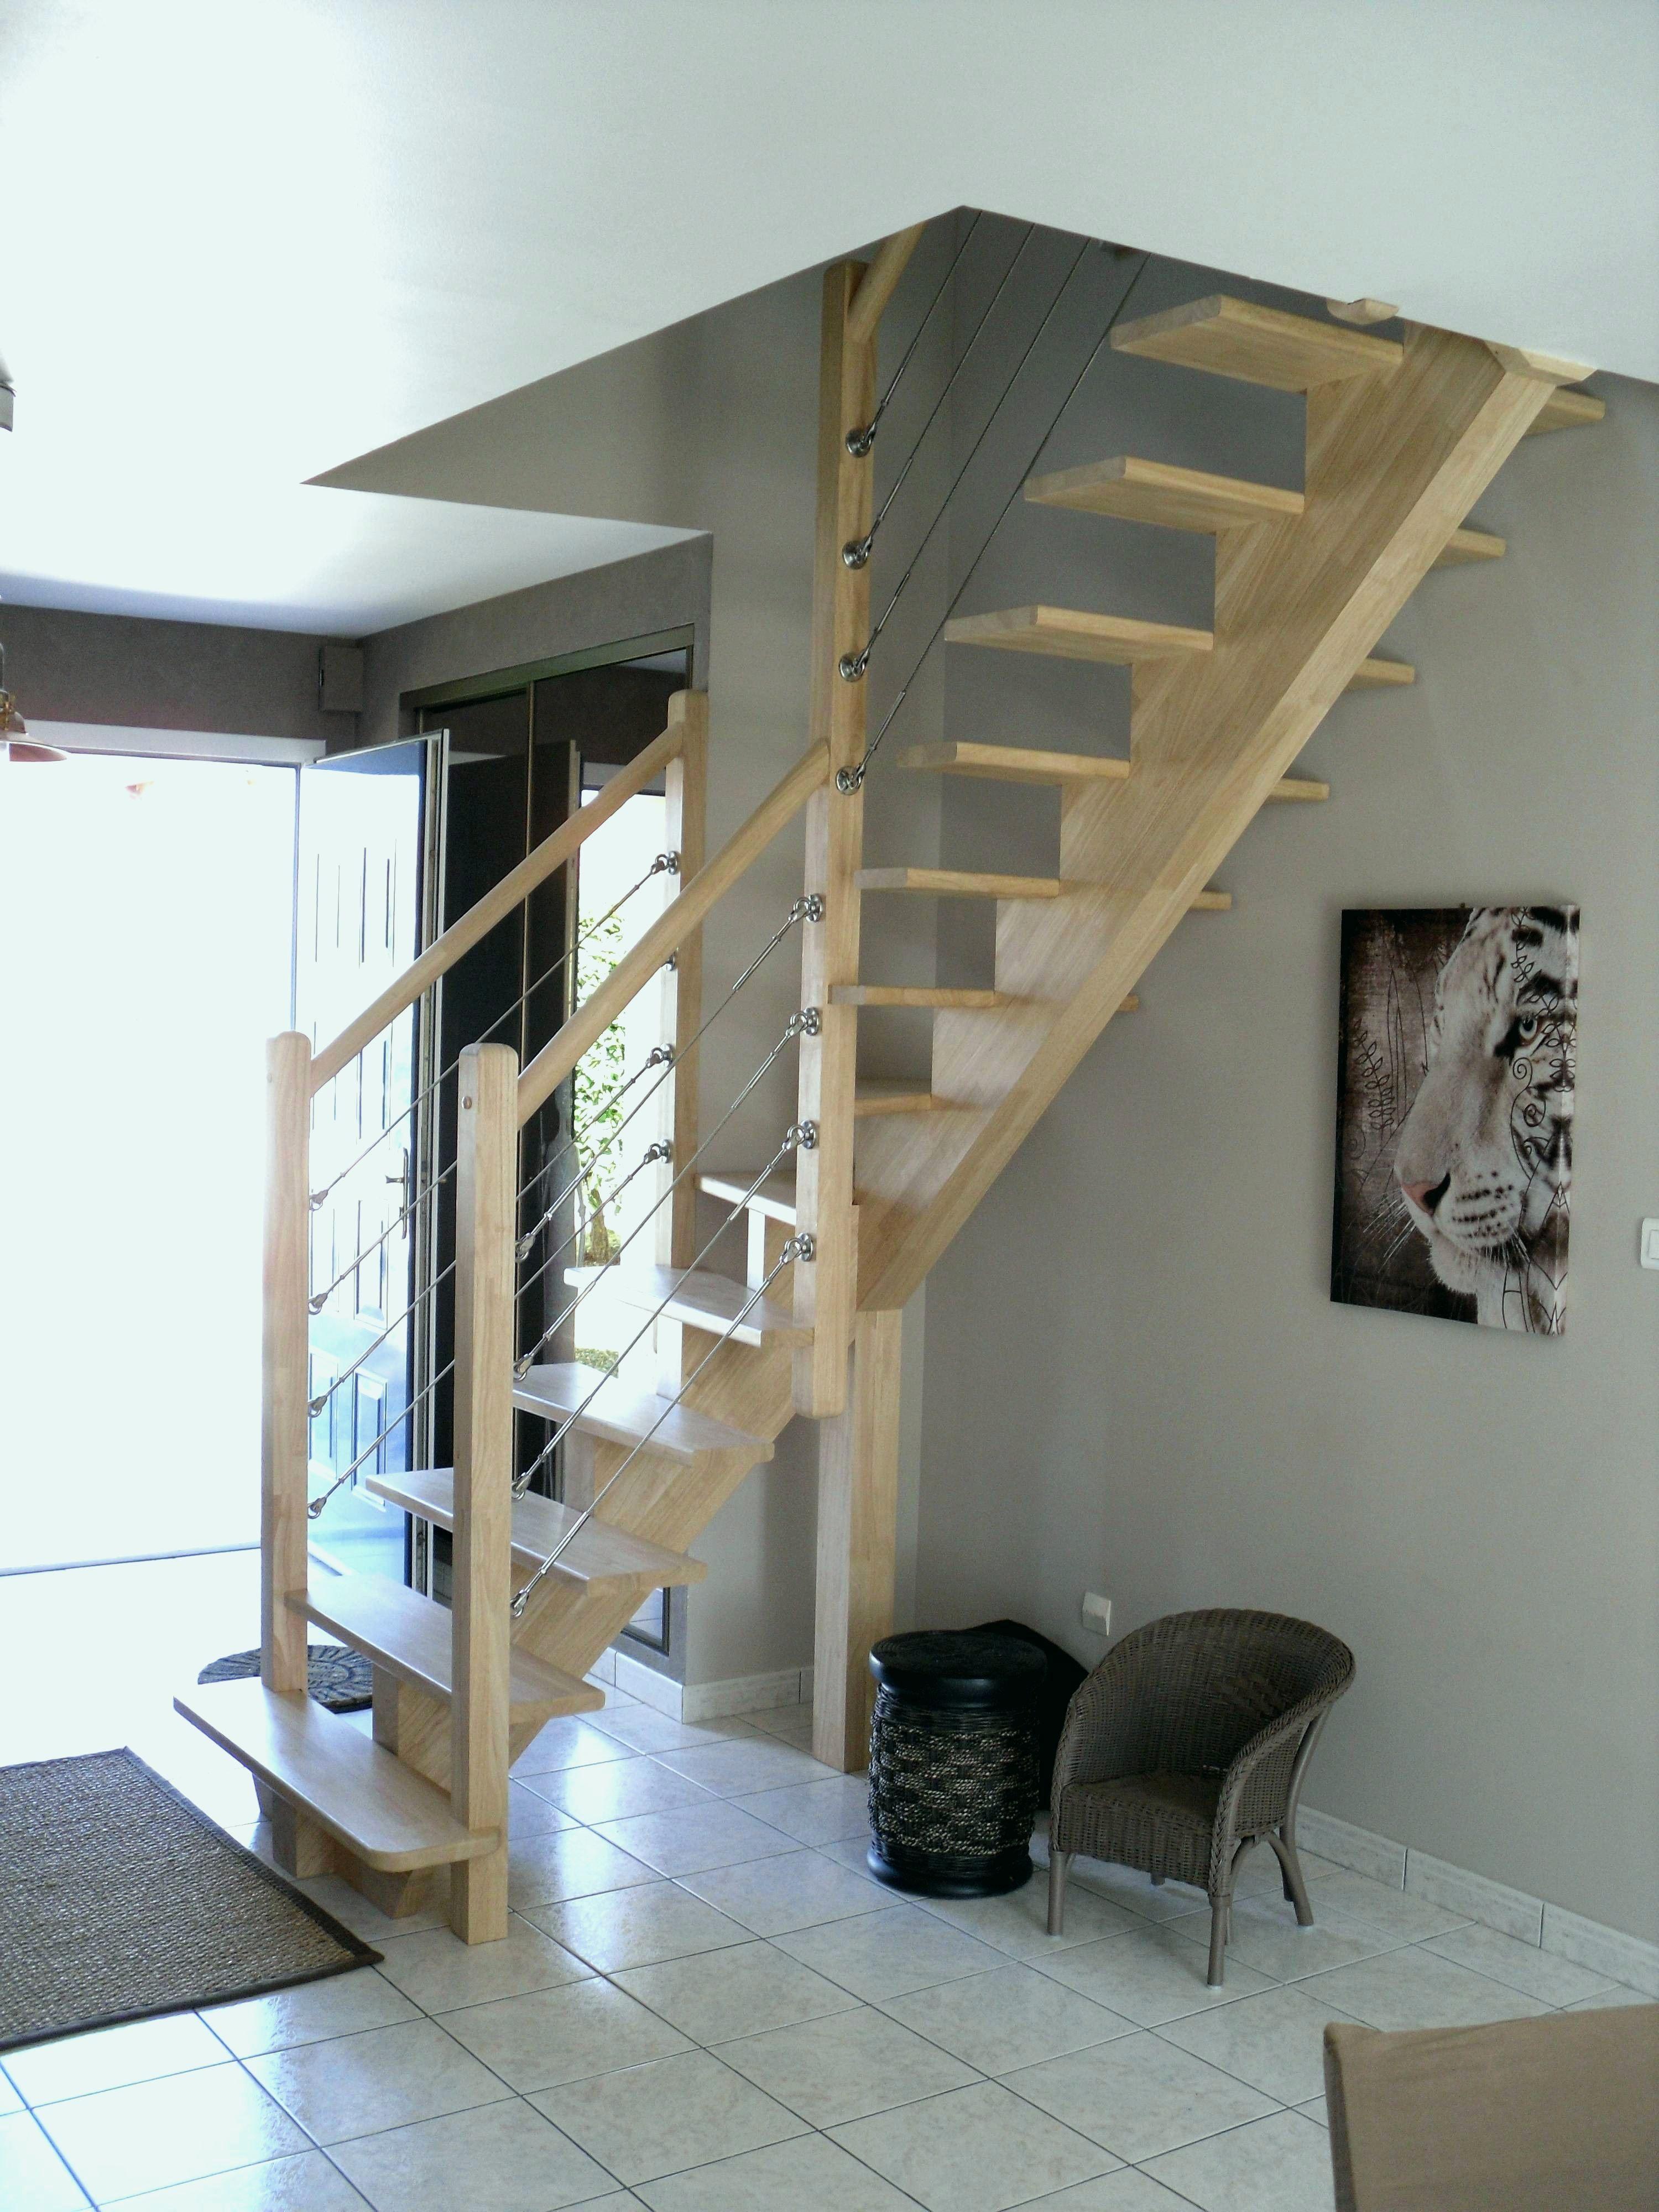 Escalier Pour Lit Mezzanine Joli Mezzanine En Bois Frais Choisir Un Escalier Pour Mezzanine Pour son